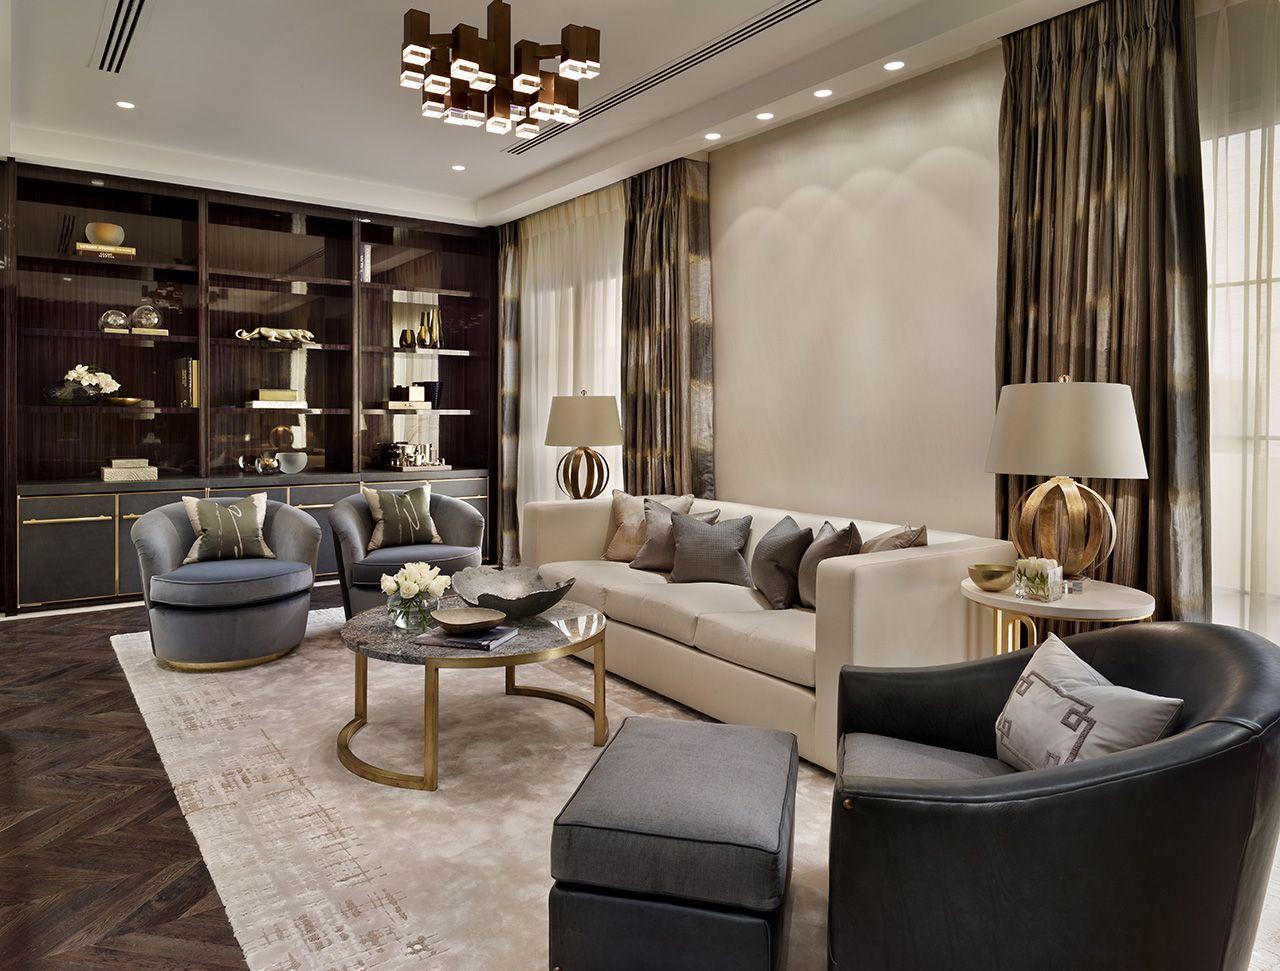 West Bay Qatar Luxury Interior Design Katharine Pooley Modern Classic Living Room Luxury Living Room Design Luxury Living Room